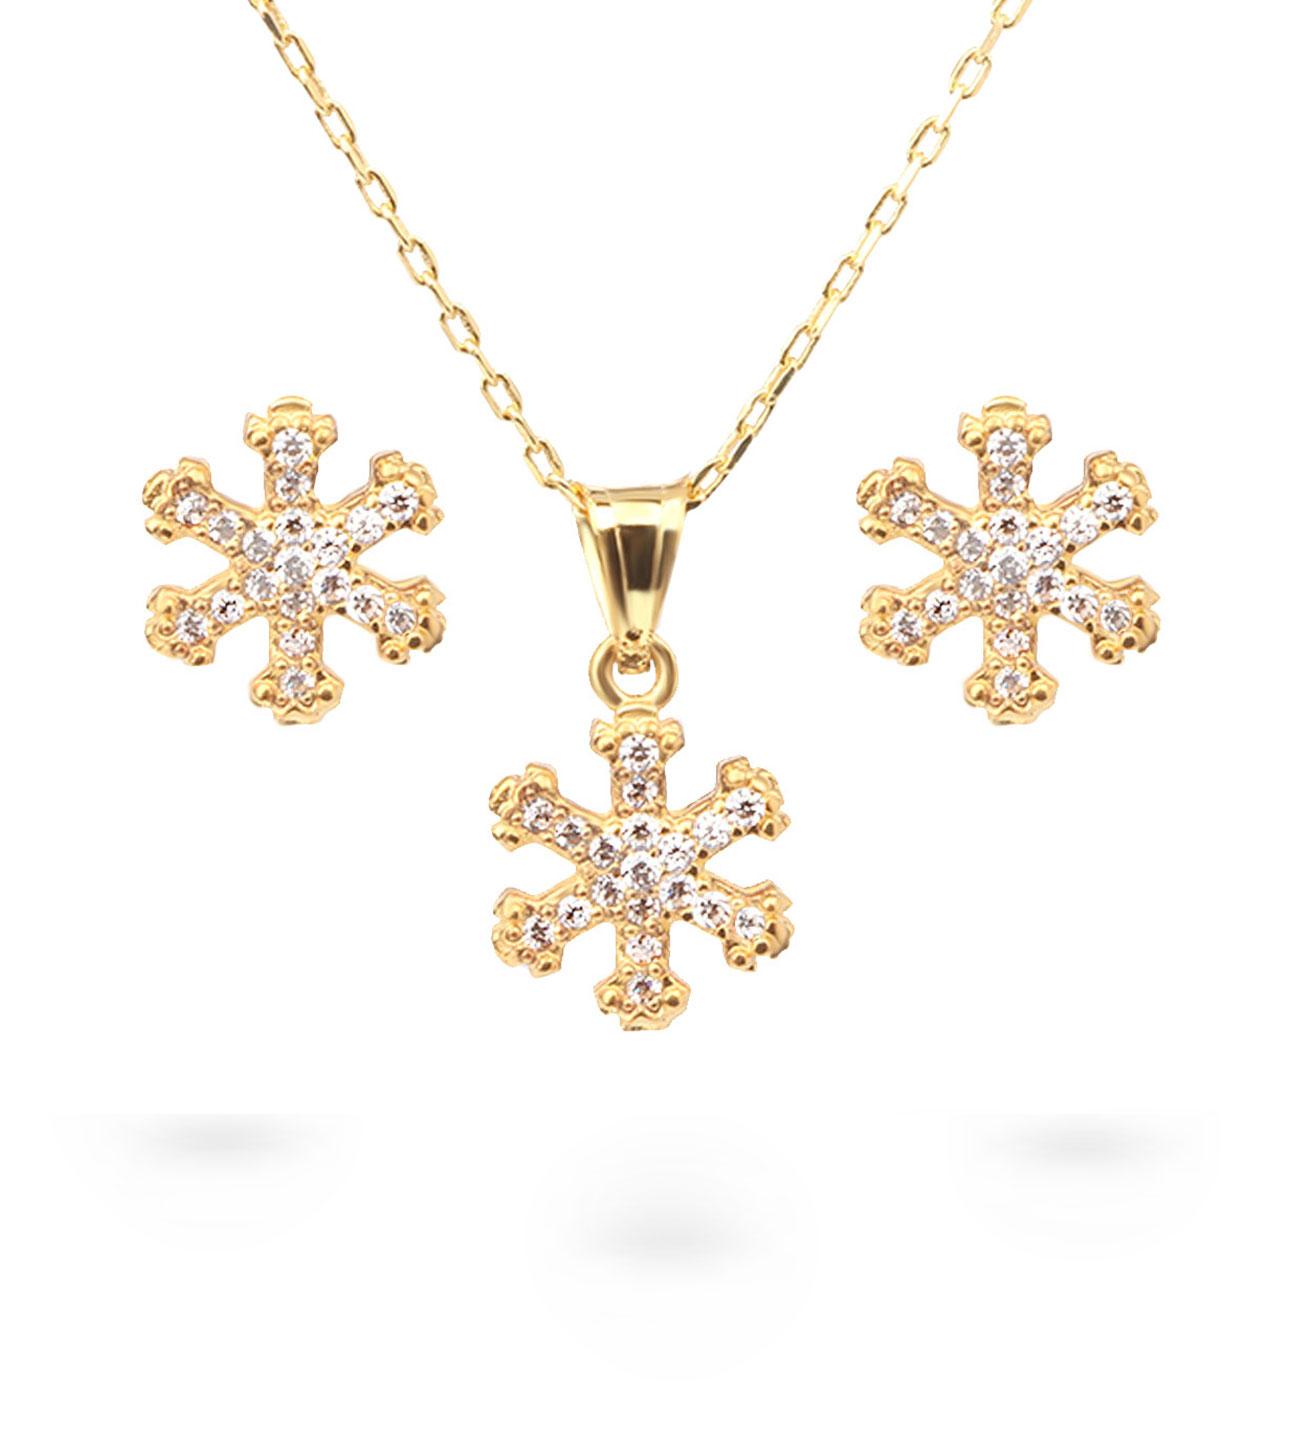 Women's Snowflake Pendant Gold Necklace & Earrings Set